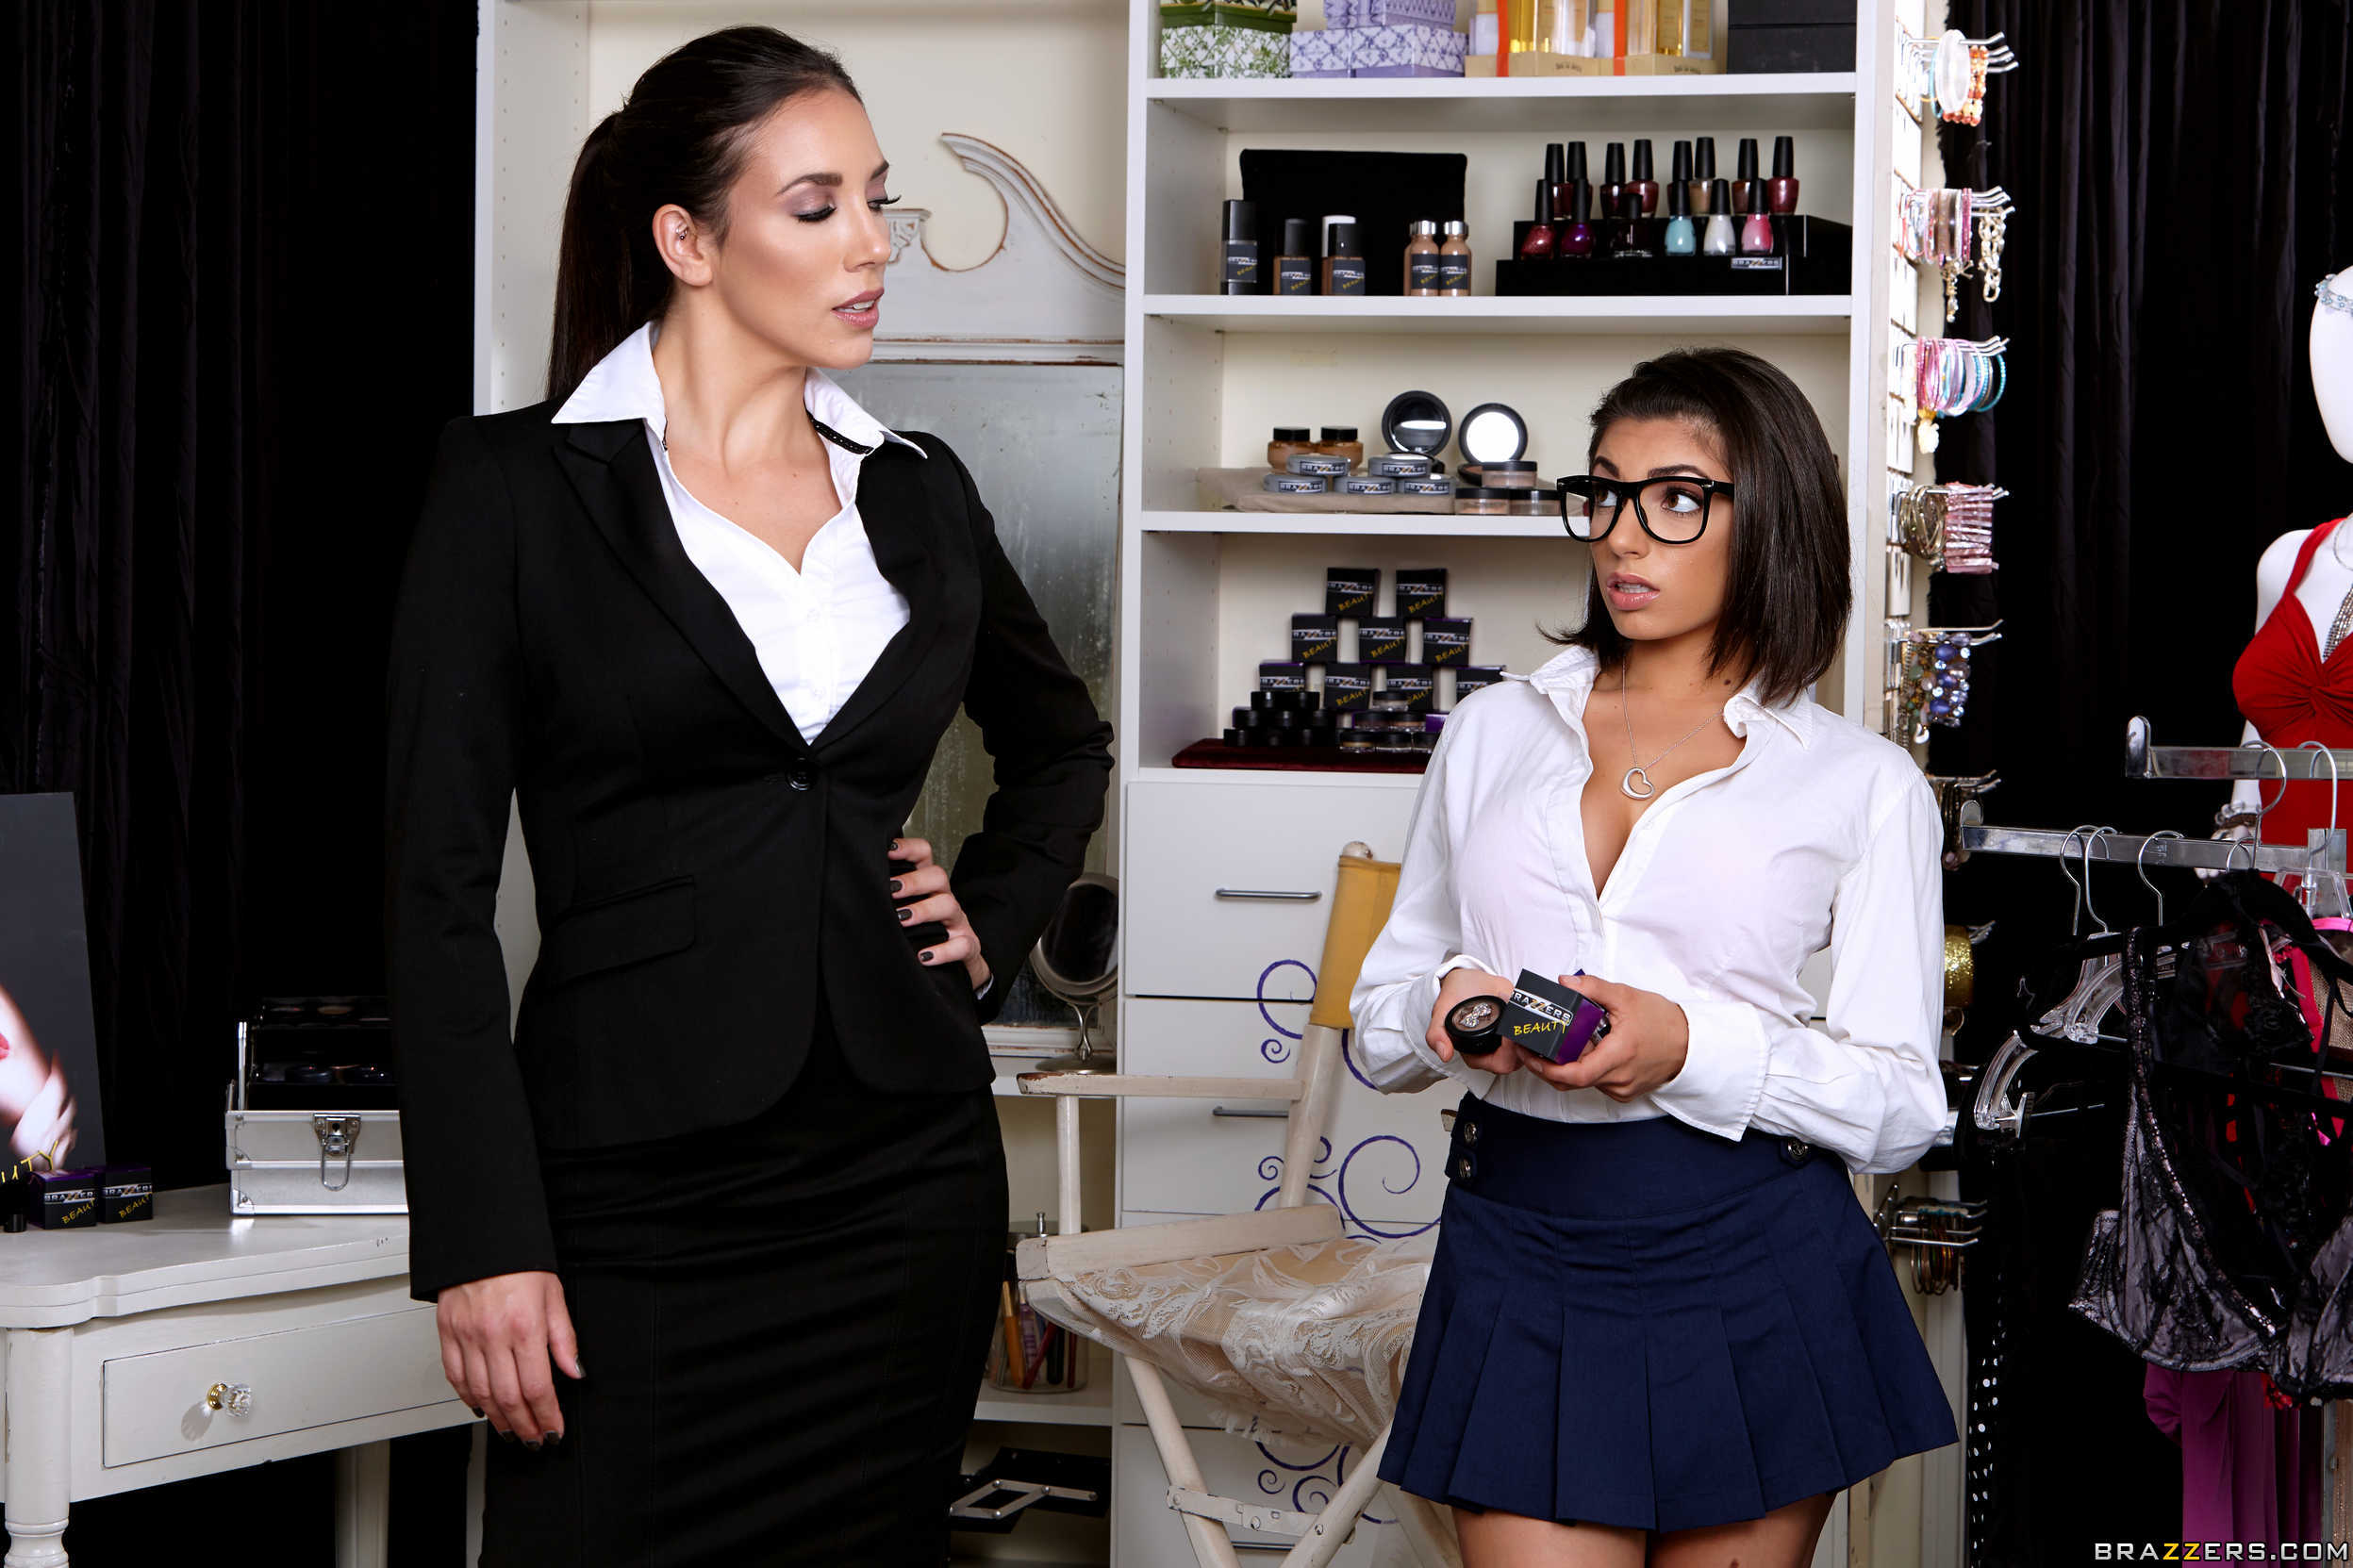 Jelena Jensen y Darcie Dolce- un juguete para sus conchitas